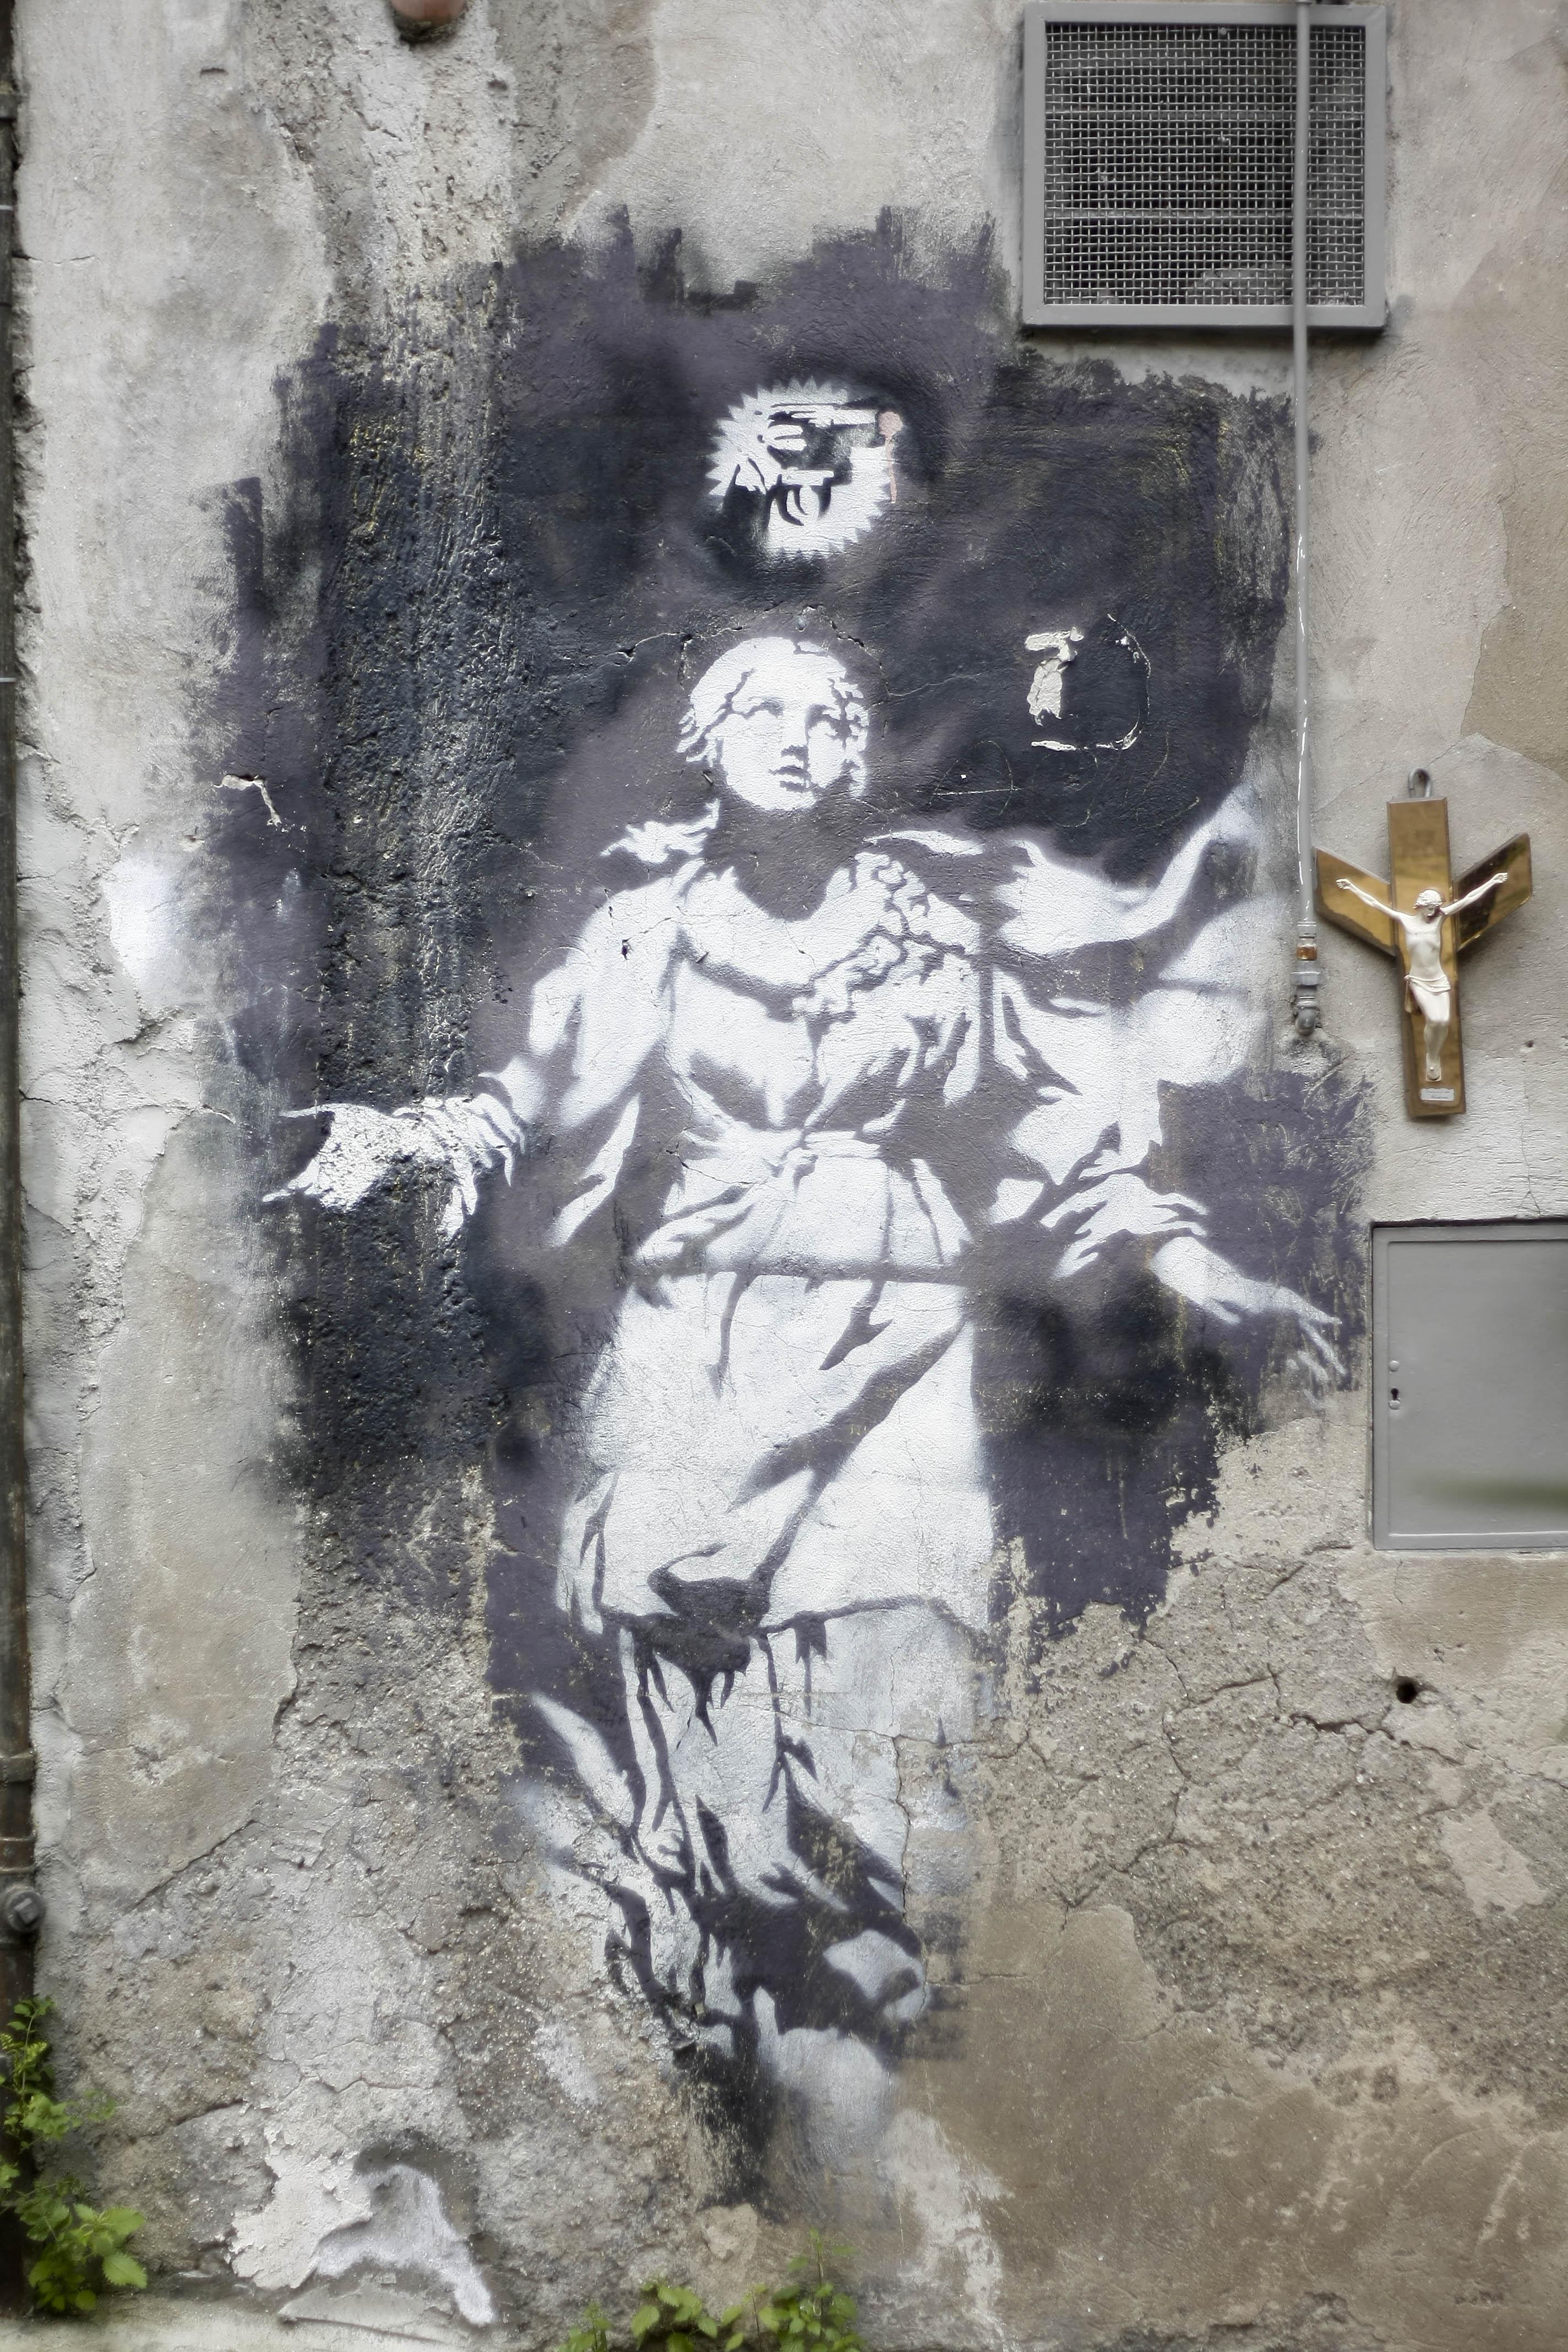 Inward, un osservatorio mondiale per la tutela della street art: salviamo la Madonna con la pistola di Banksy